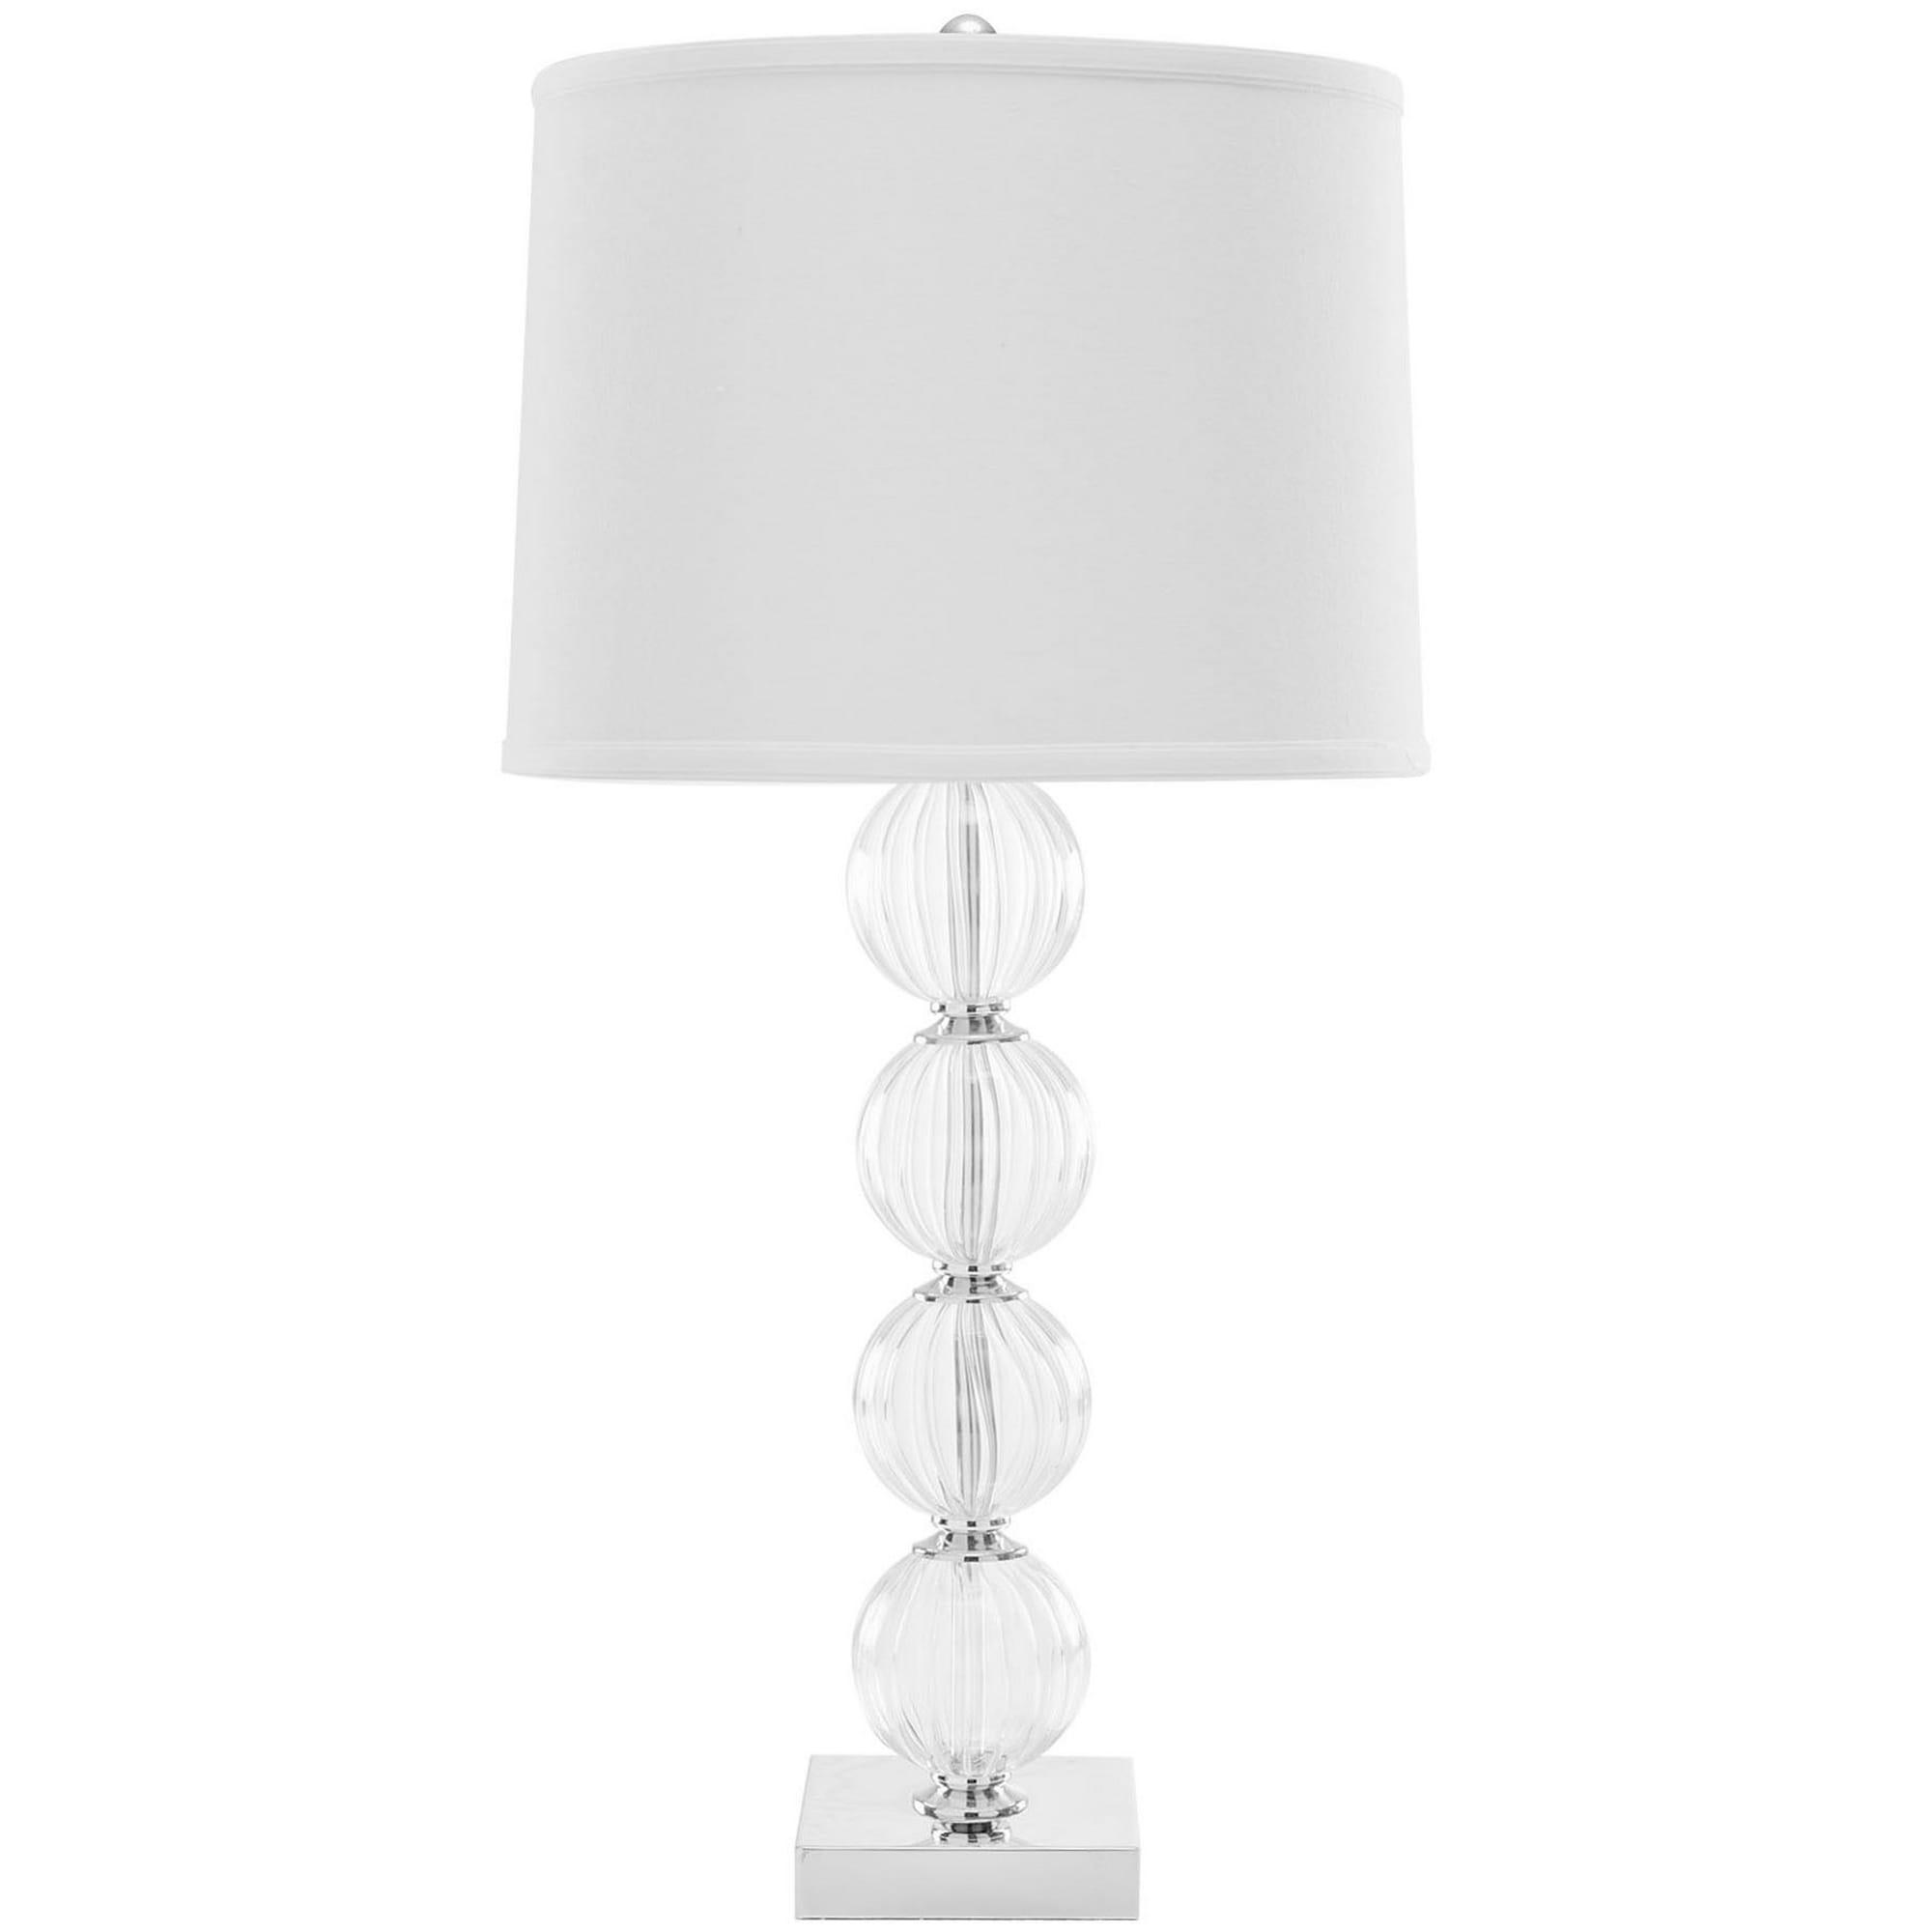 Safavieh Lighting 30-inch Amanda White Crystal Glass Glob...